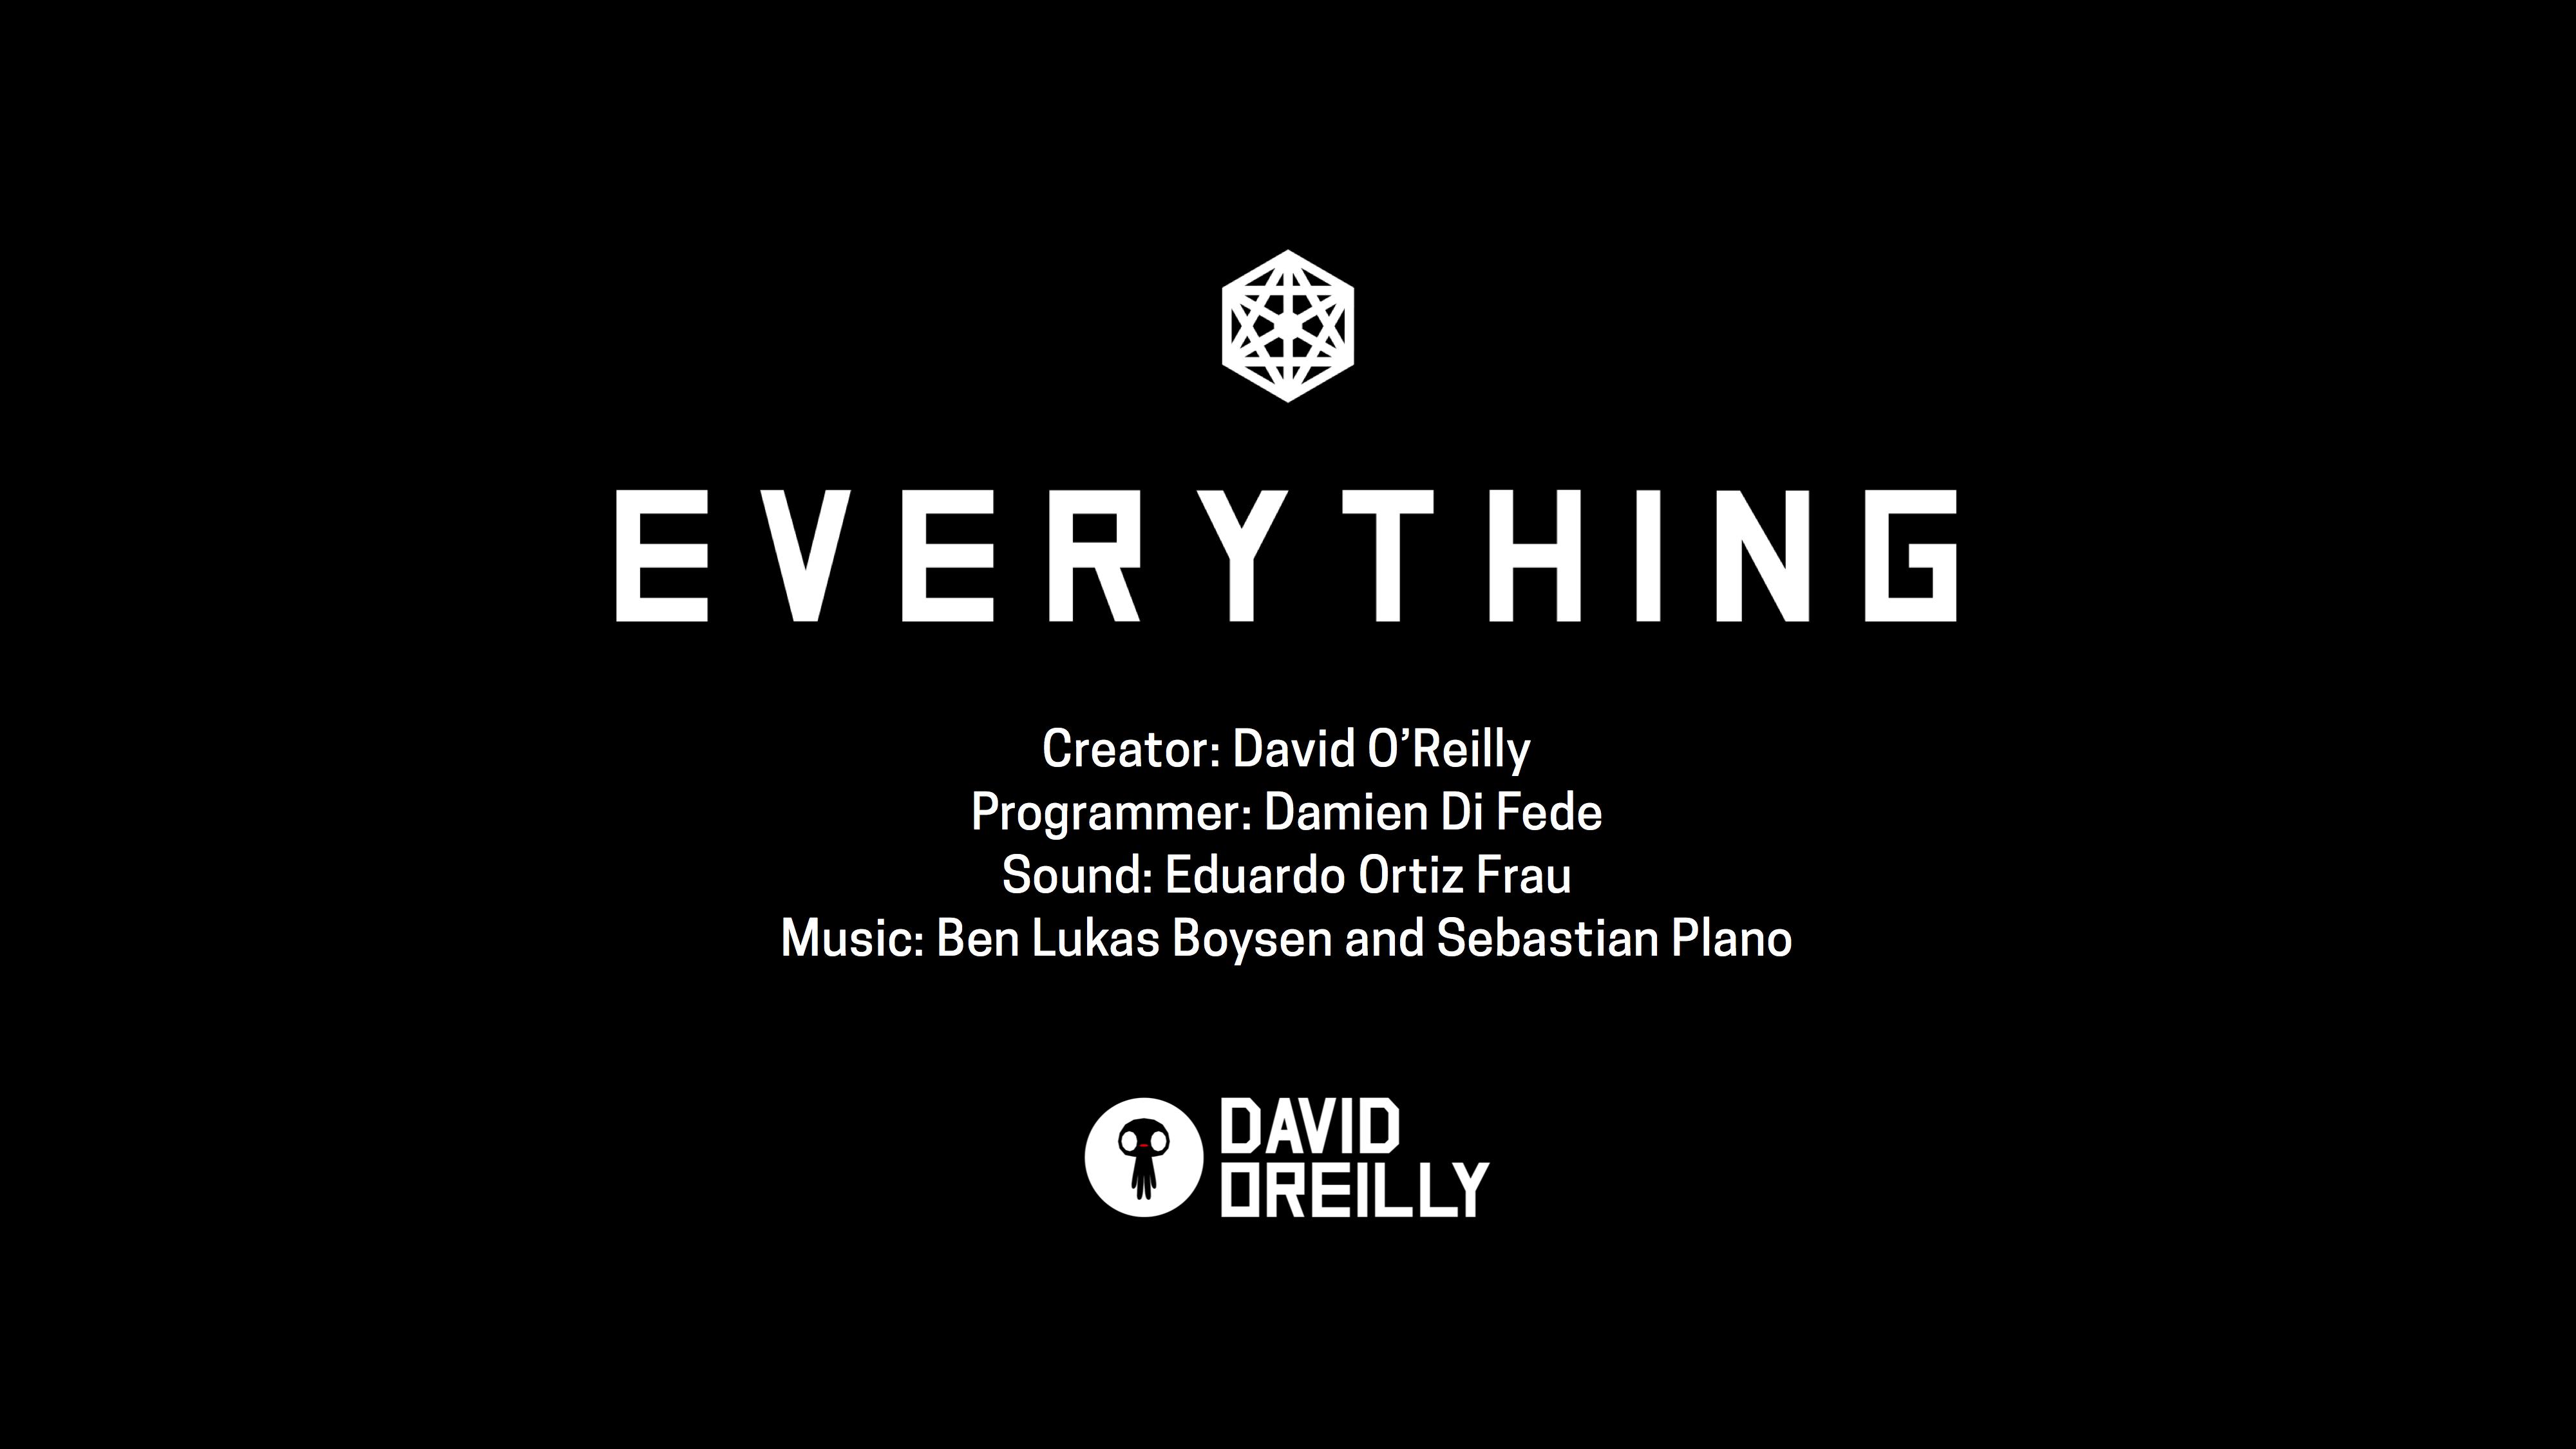 Everything credits